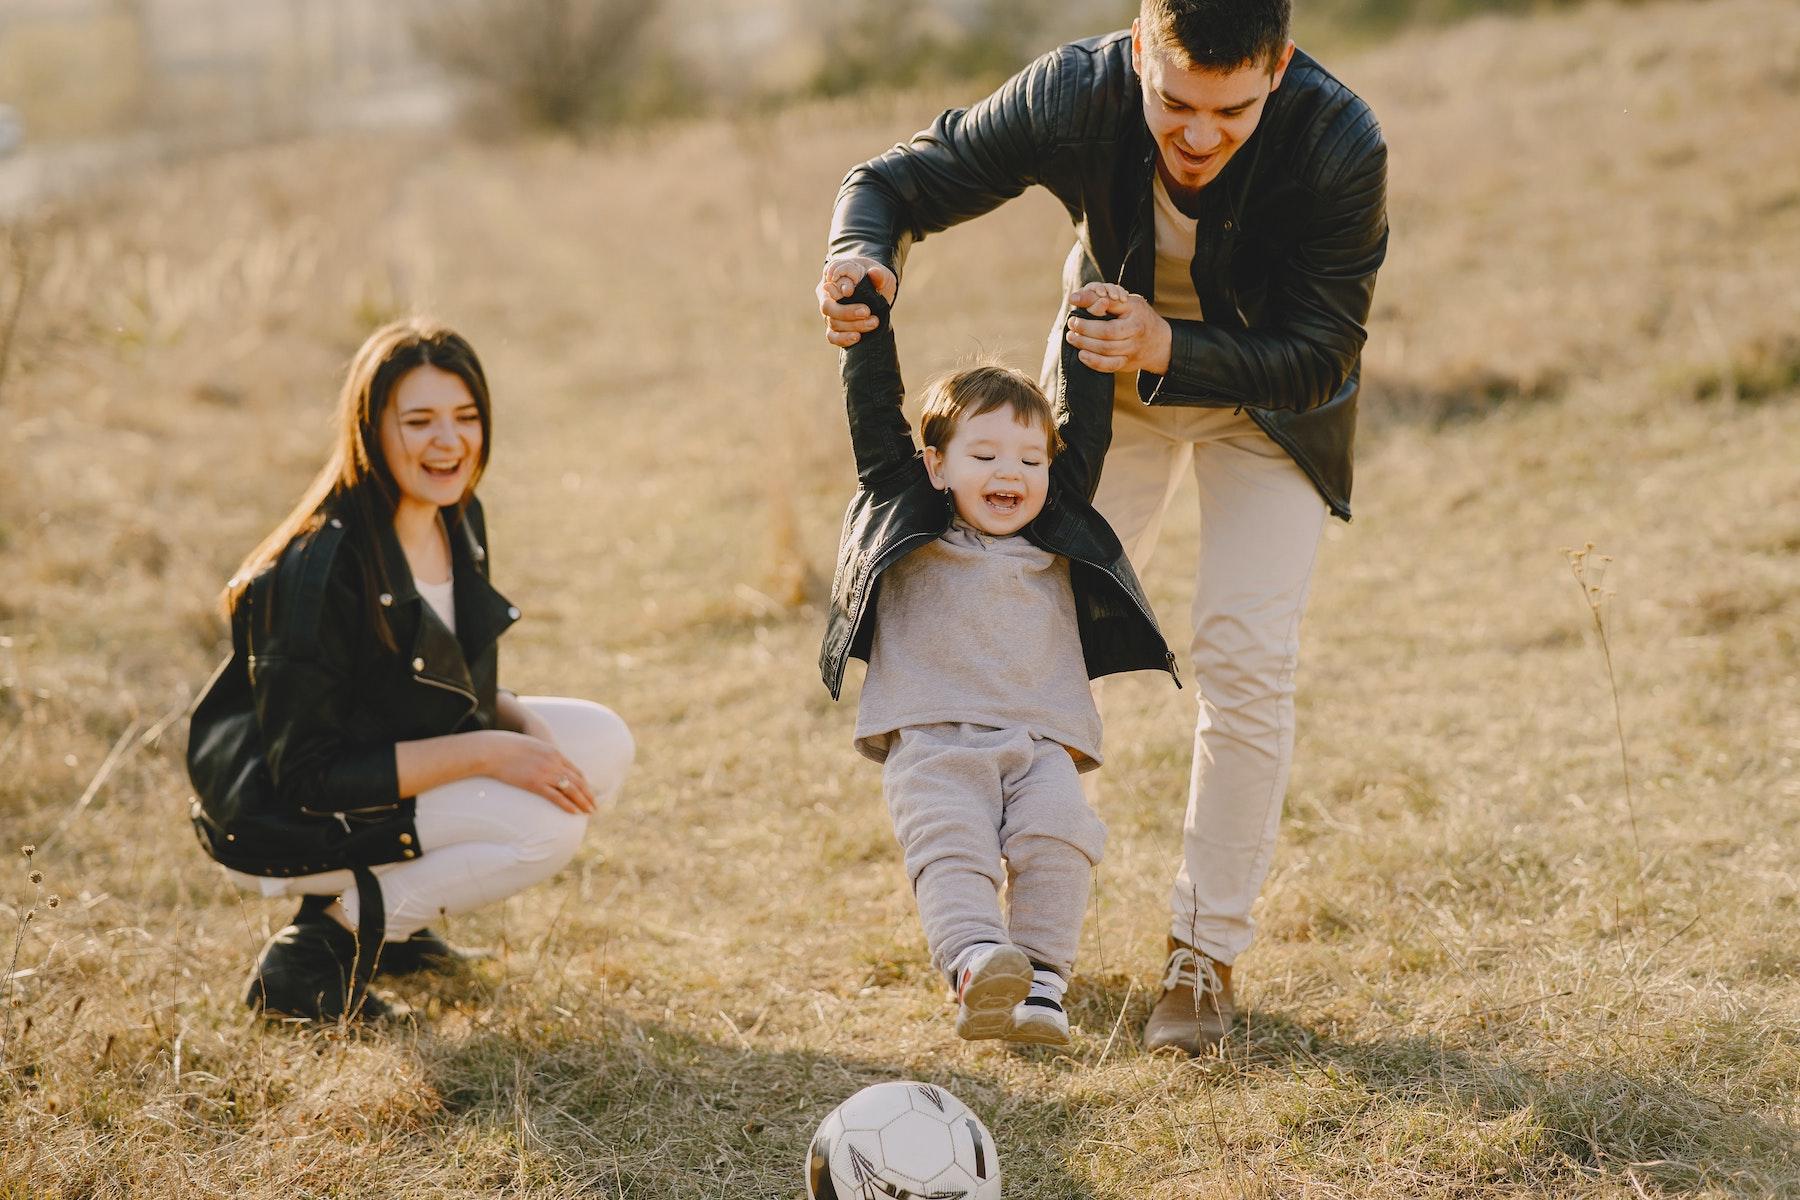 2021 Mental Health Goals for Every Parent | Parent Cue Blog